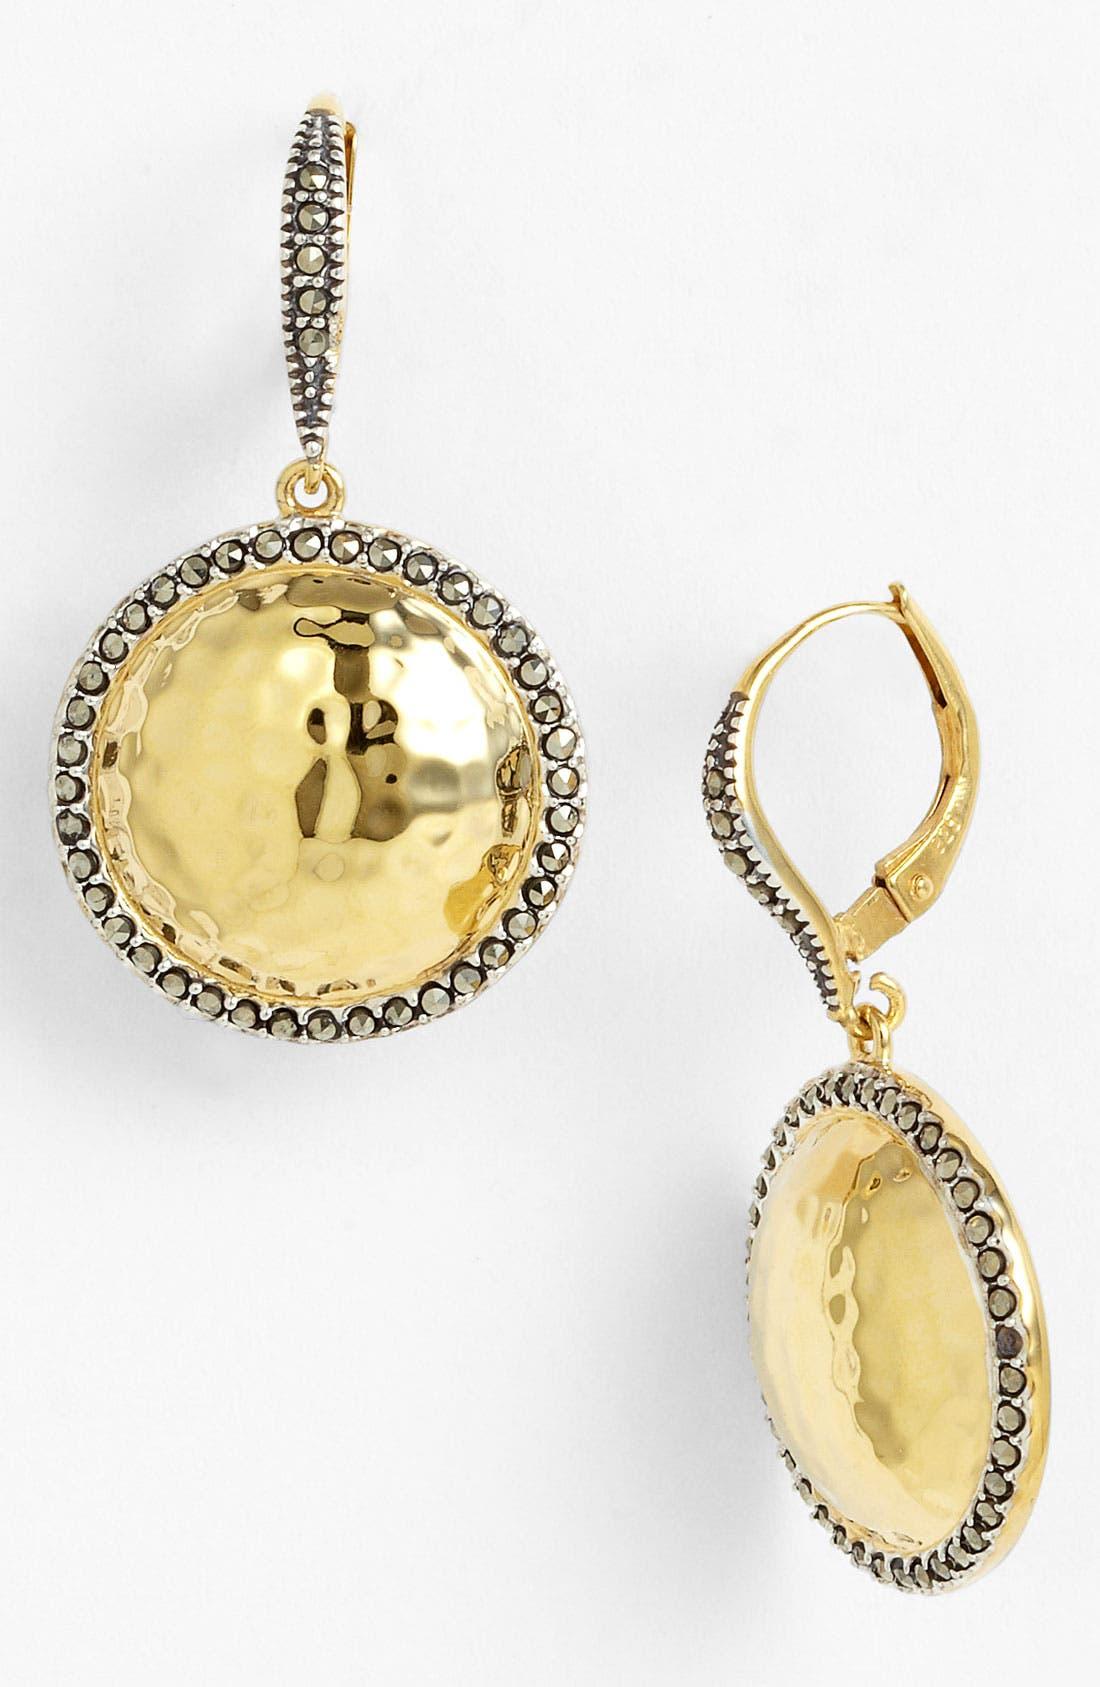 Main Image - Judith Jack 'Gold Sea' Puffy Dome Drop Earrings